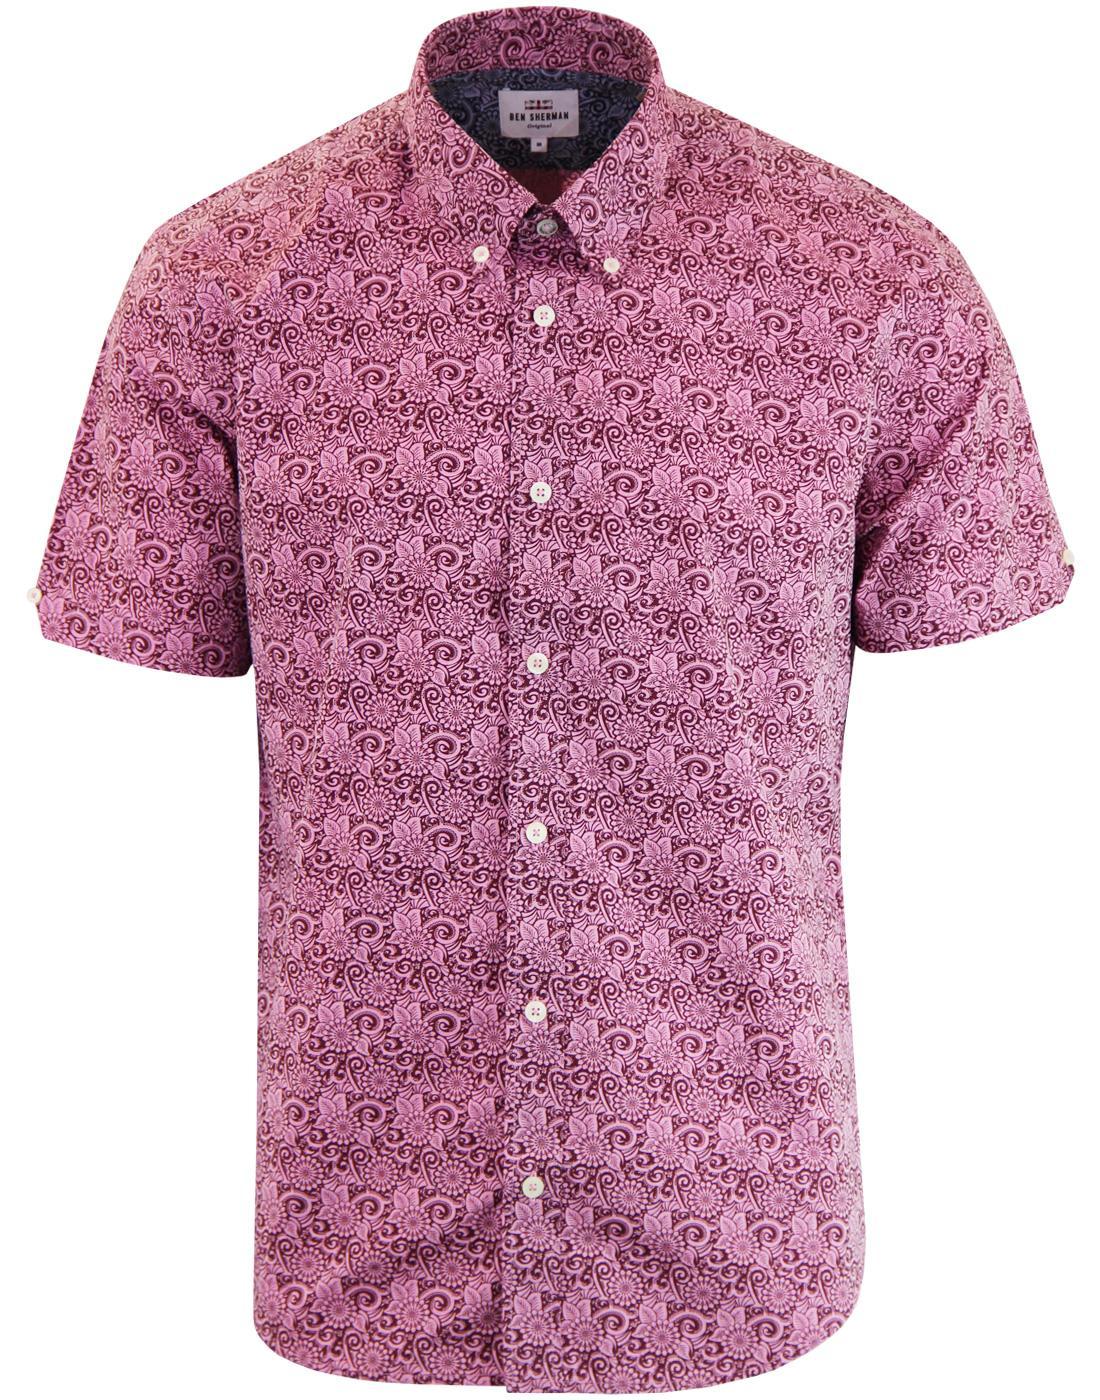 BEN SHERMAN 1960s Mod Stencil Floral Shirt ROSE